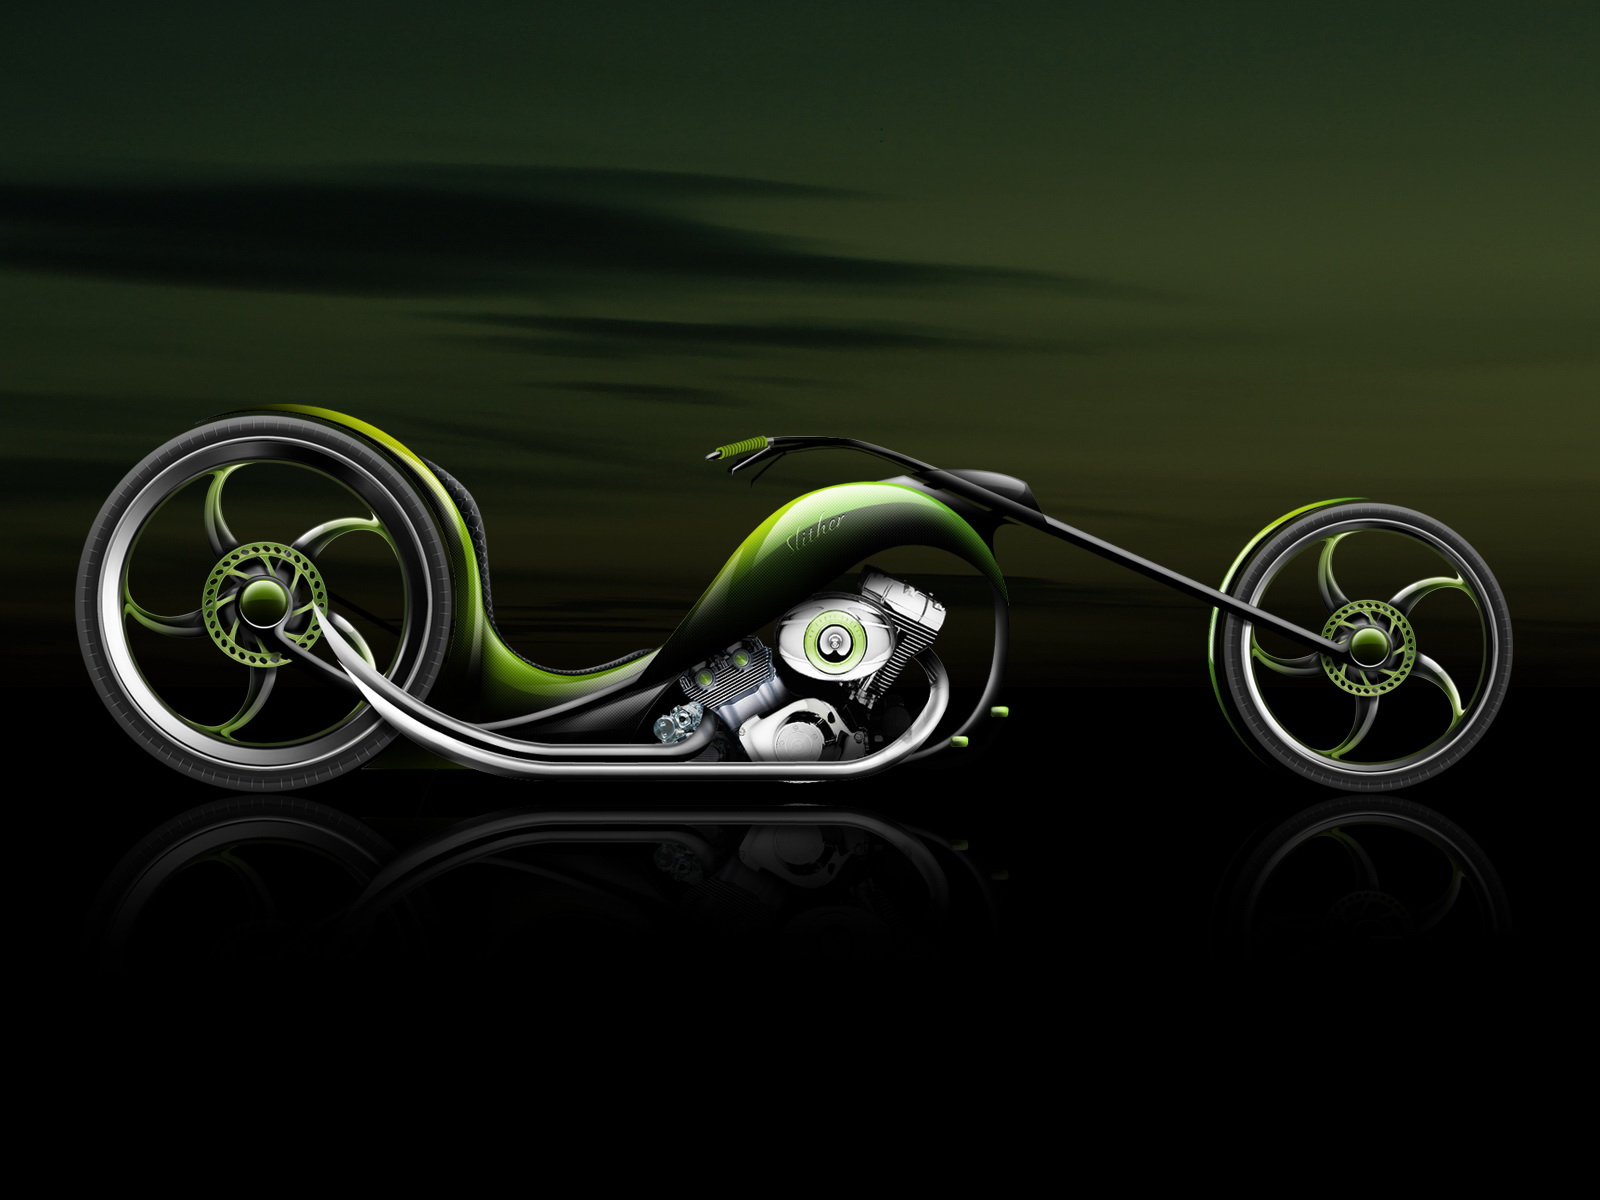 bike wallpaper 2 1600x1200